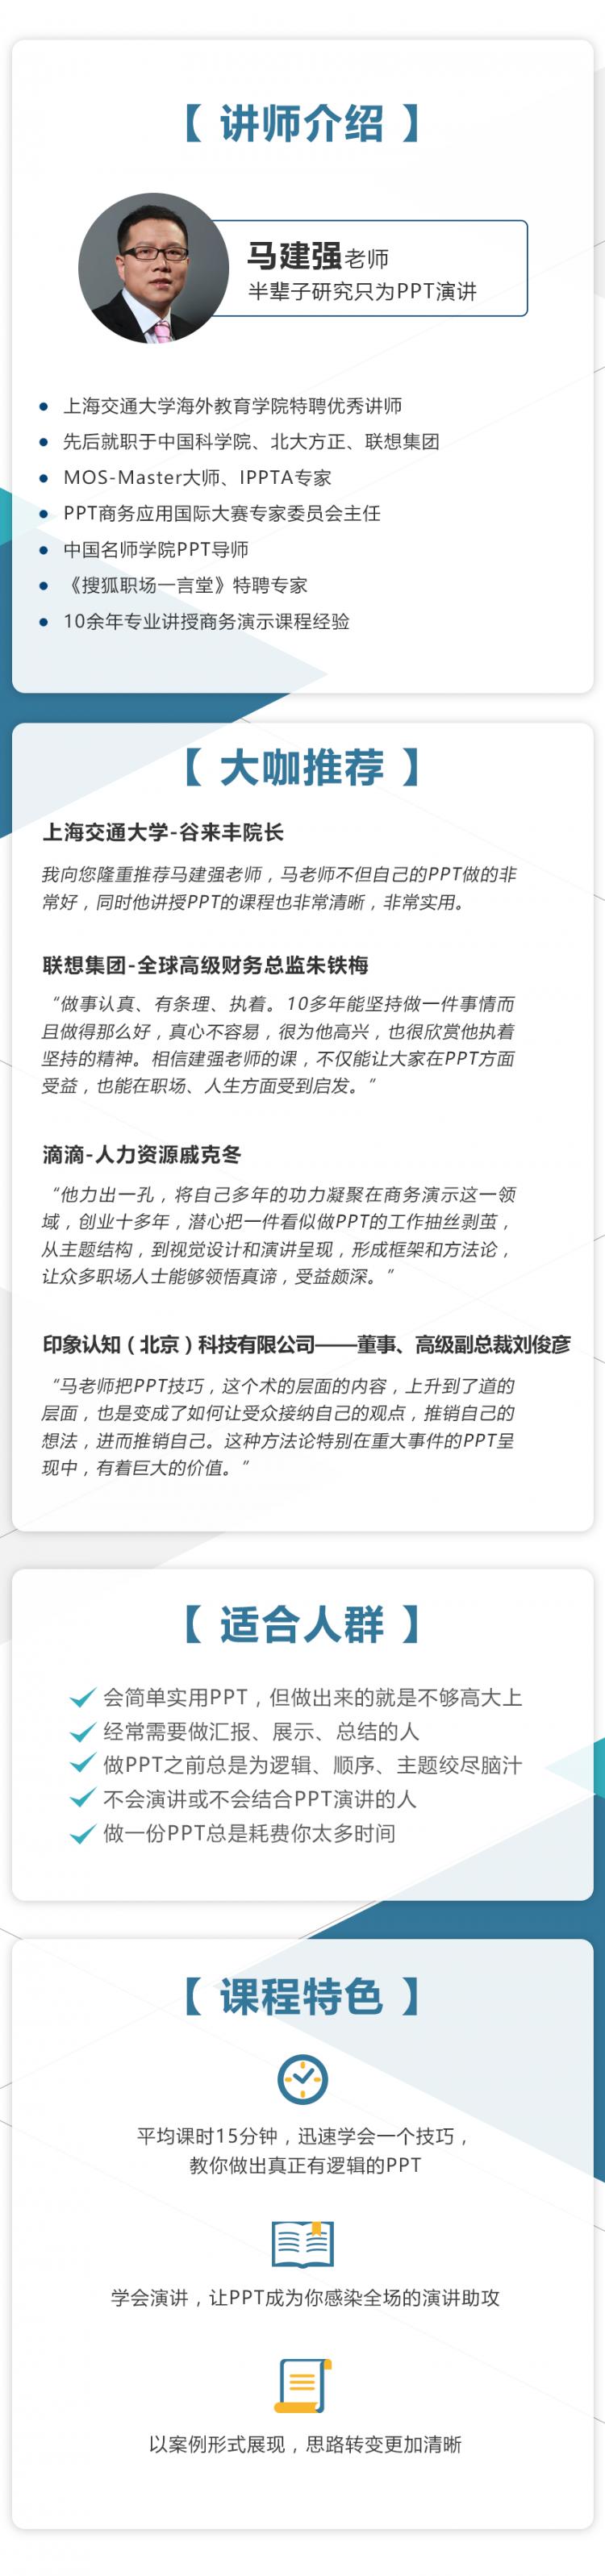 荔枝PPT详情页_3_2_2——2.png